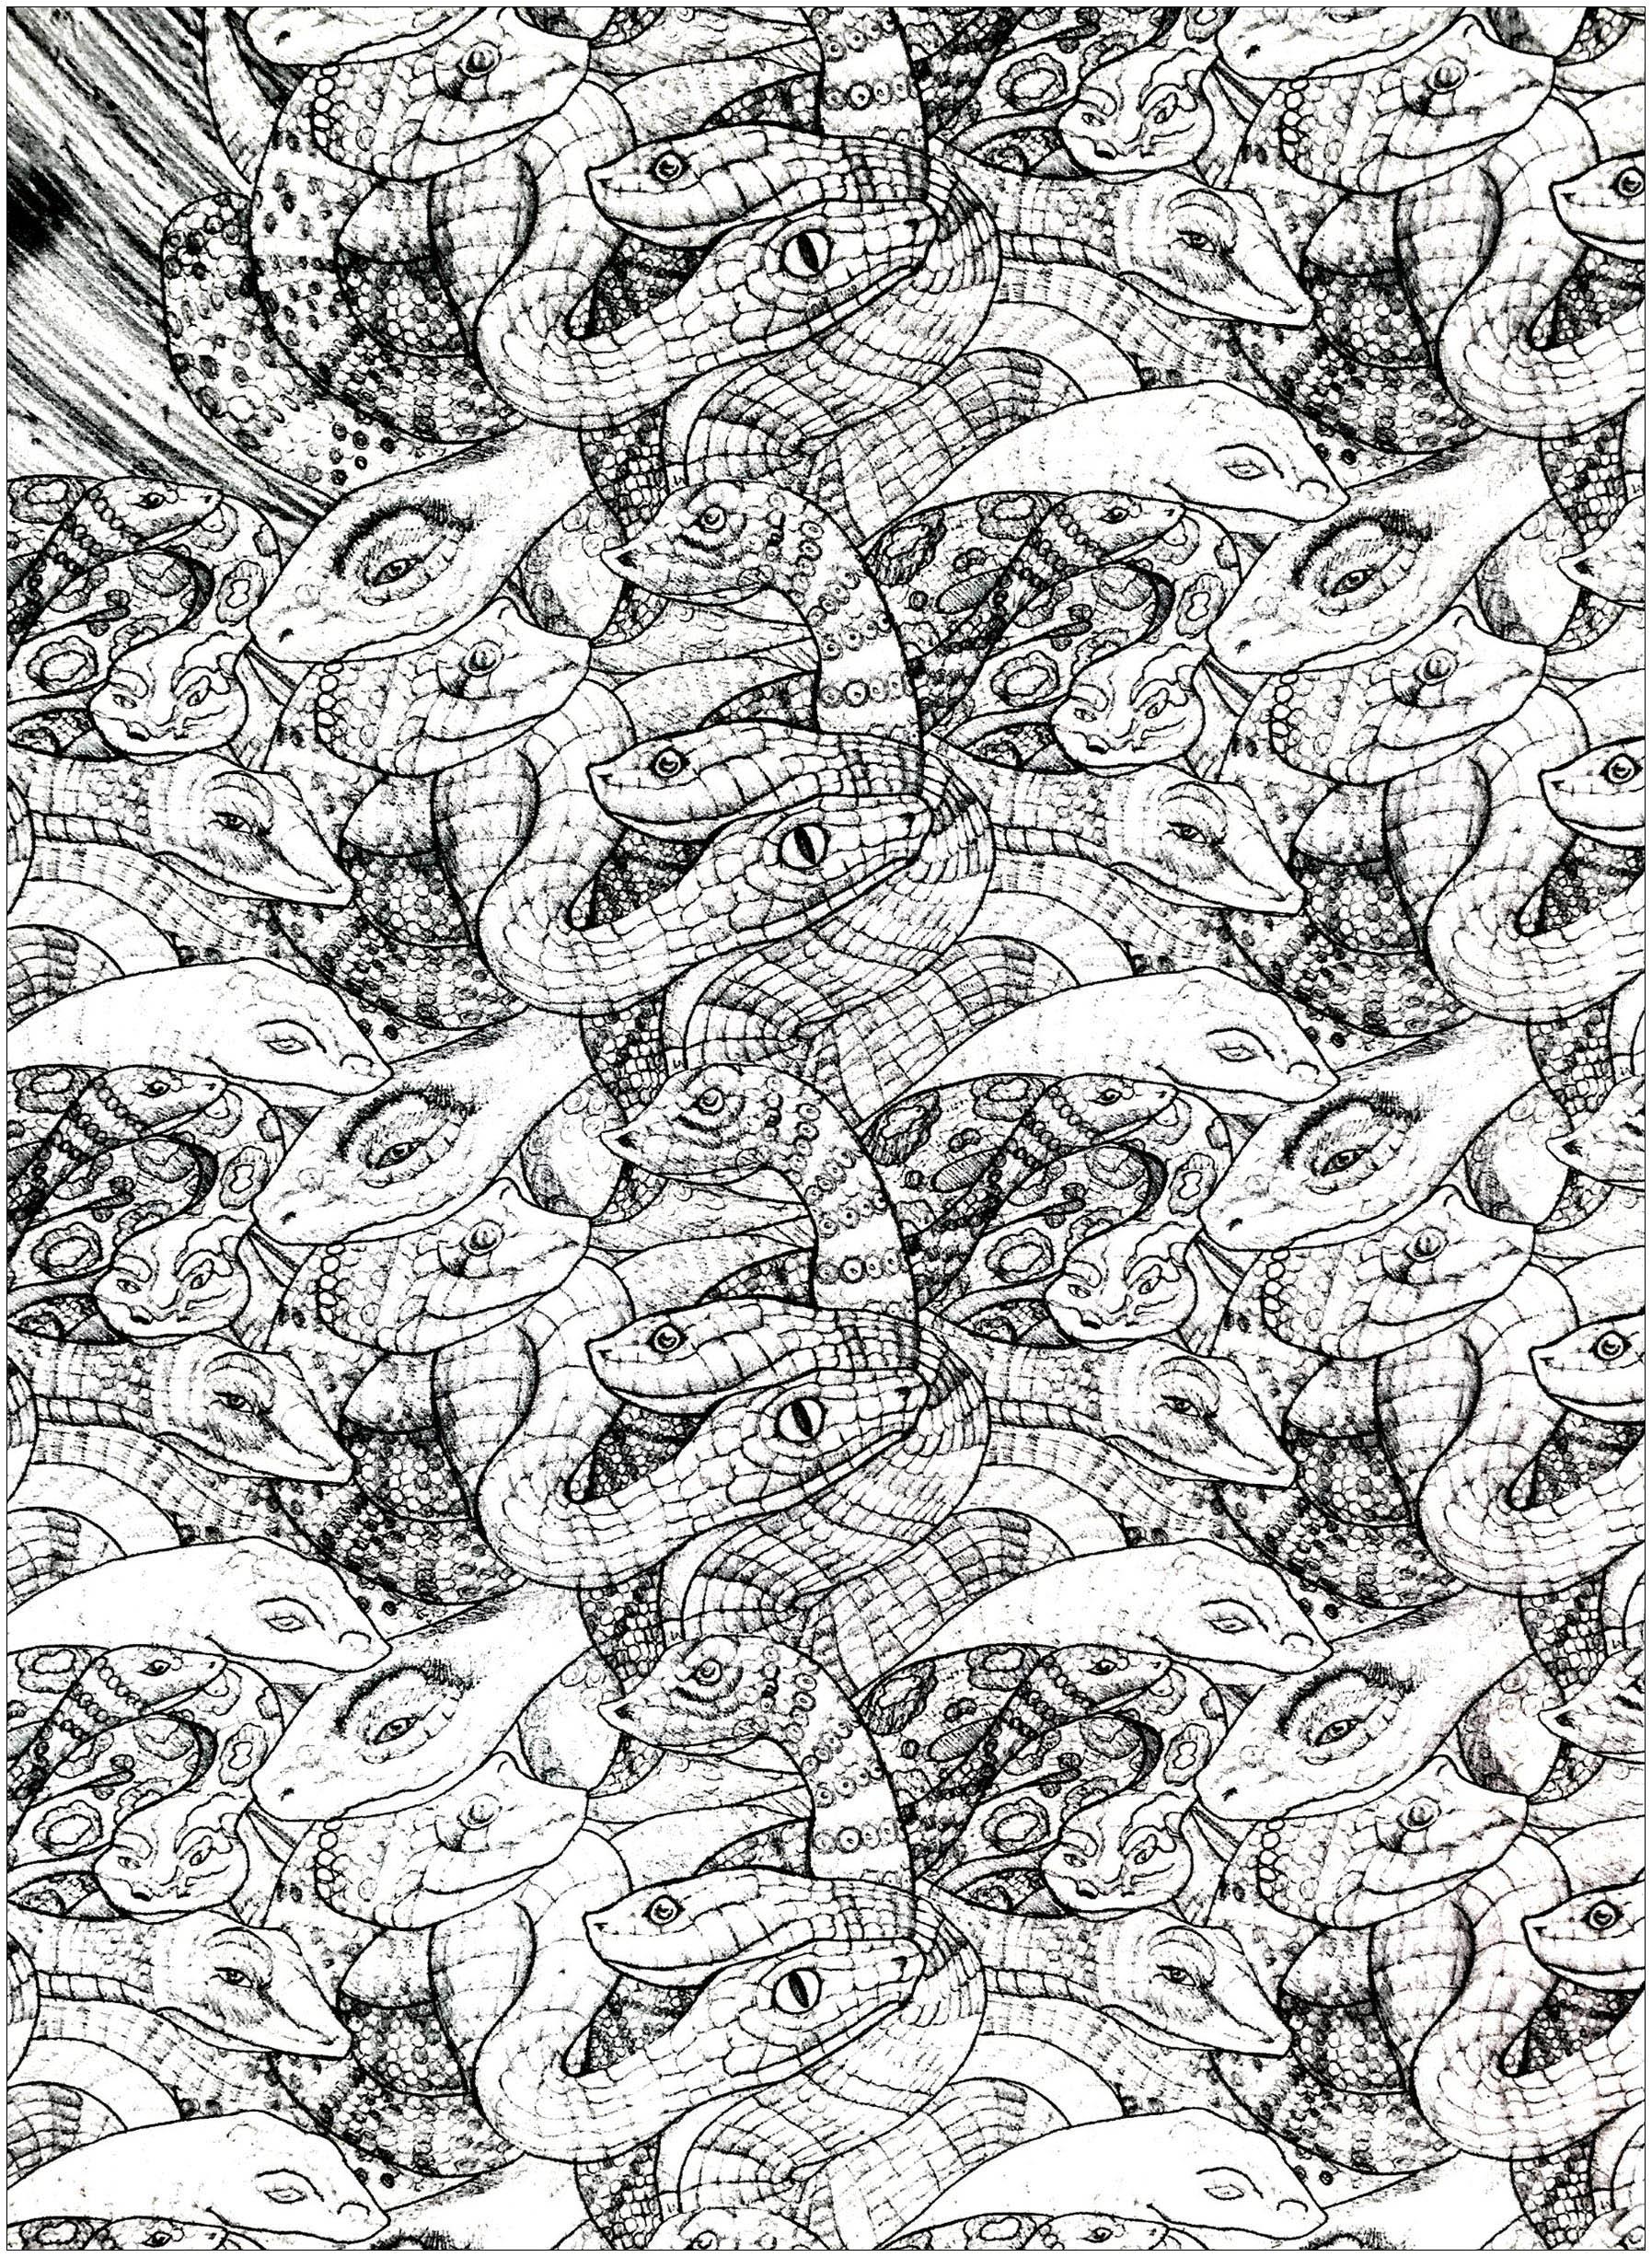 Drawing of mixed snakes